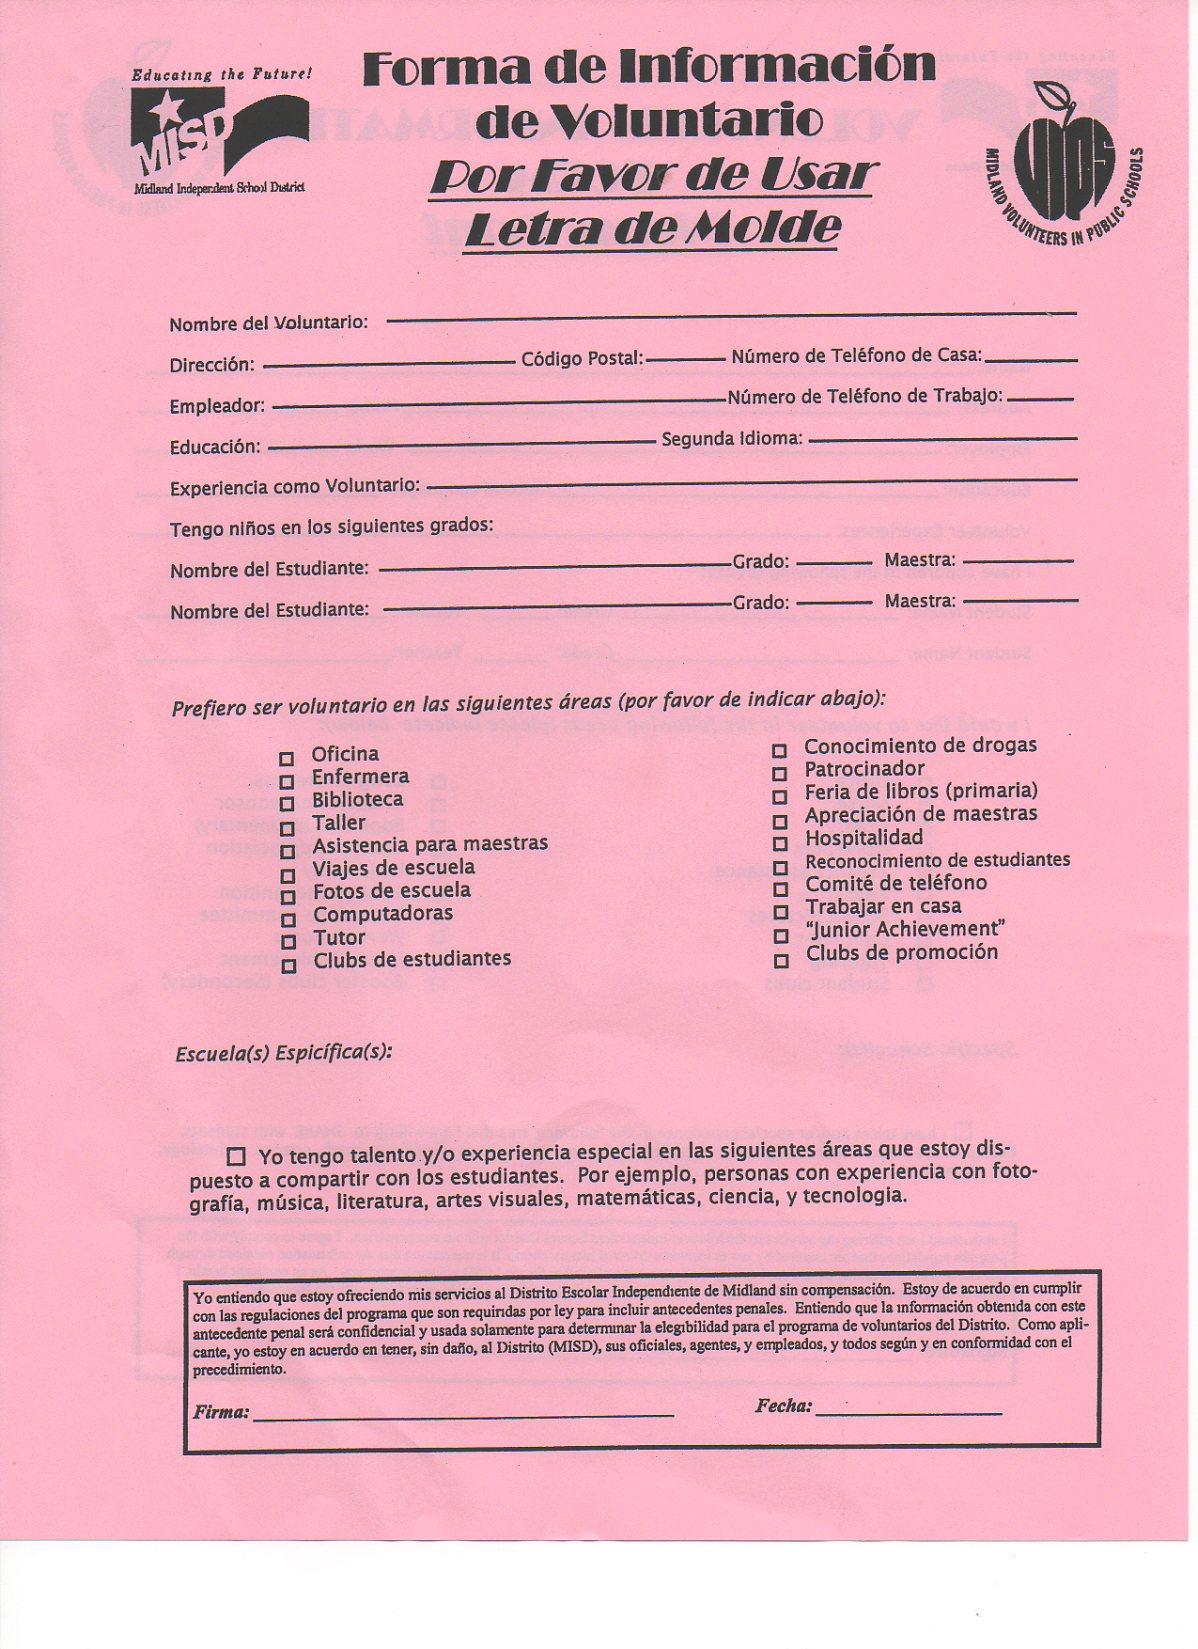 img065 Volunteer Application Form In Spanish on newsletter in spanish, benefits in spanish, program in spanish, essay in spanish, apply online in spanish, registration in spanish, history in spanish, staff in spanish, procedure in spanish, important dates in spanish, general information in spanish, education in spanish, curriculum in spanish, management in spanish, insurance in spanish, jobs in spanish, amenities in spanish, syllabus in spanish, checklist in spanish, schedule in spanish,